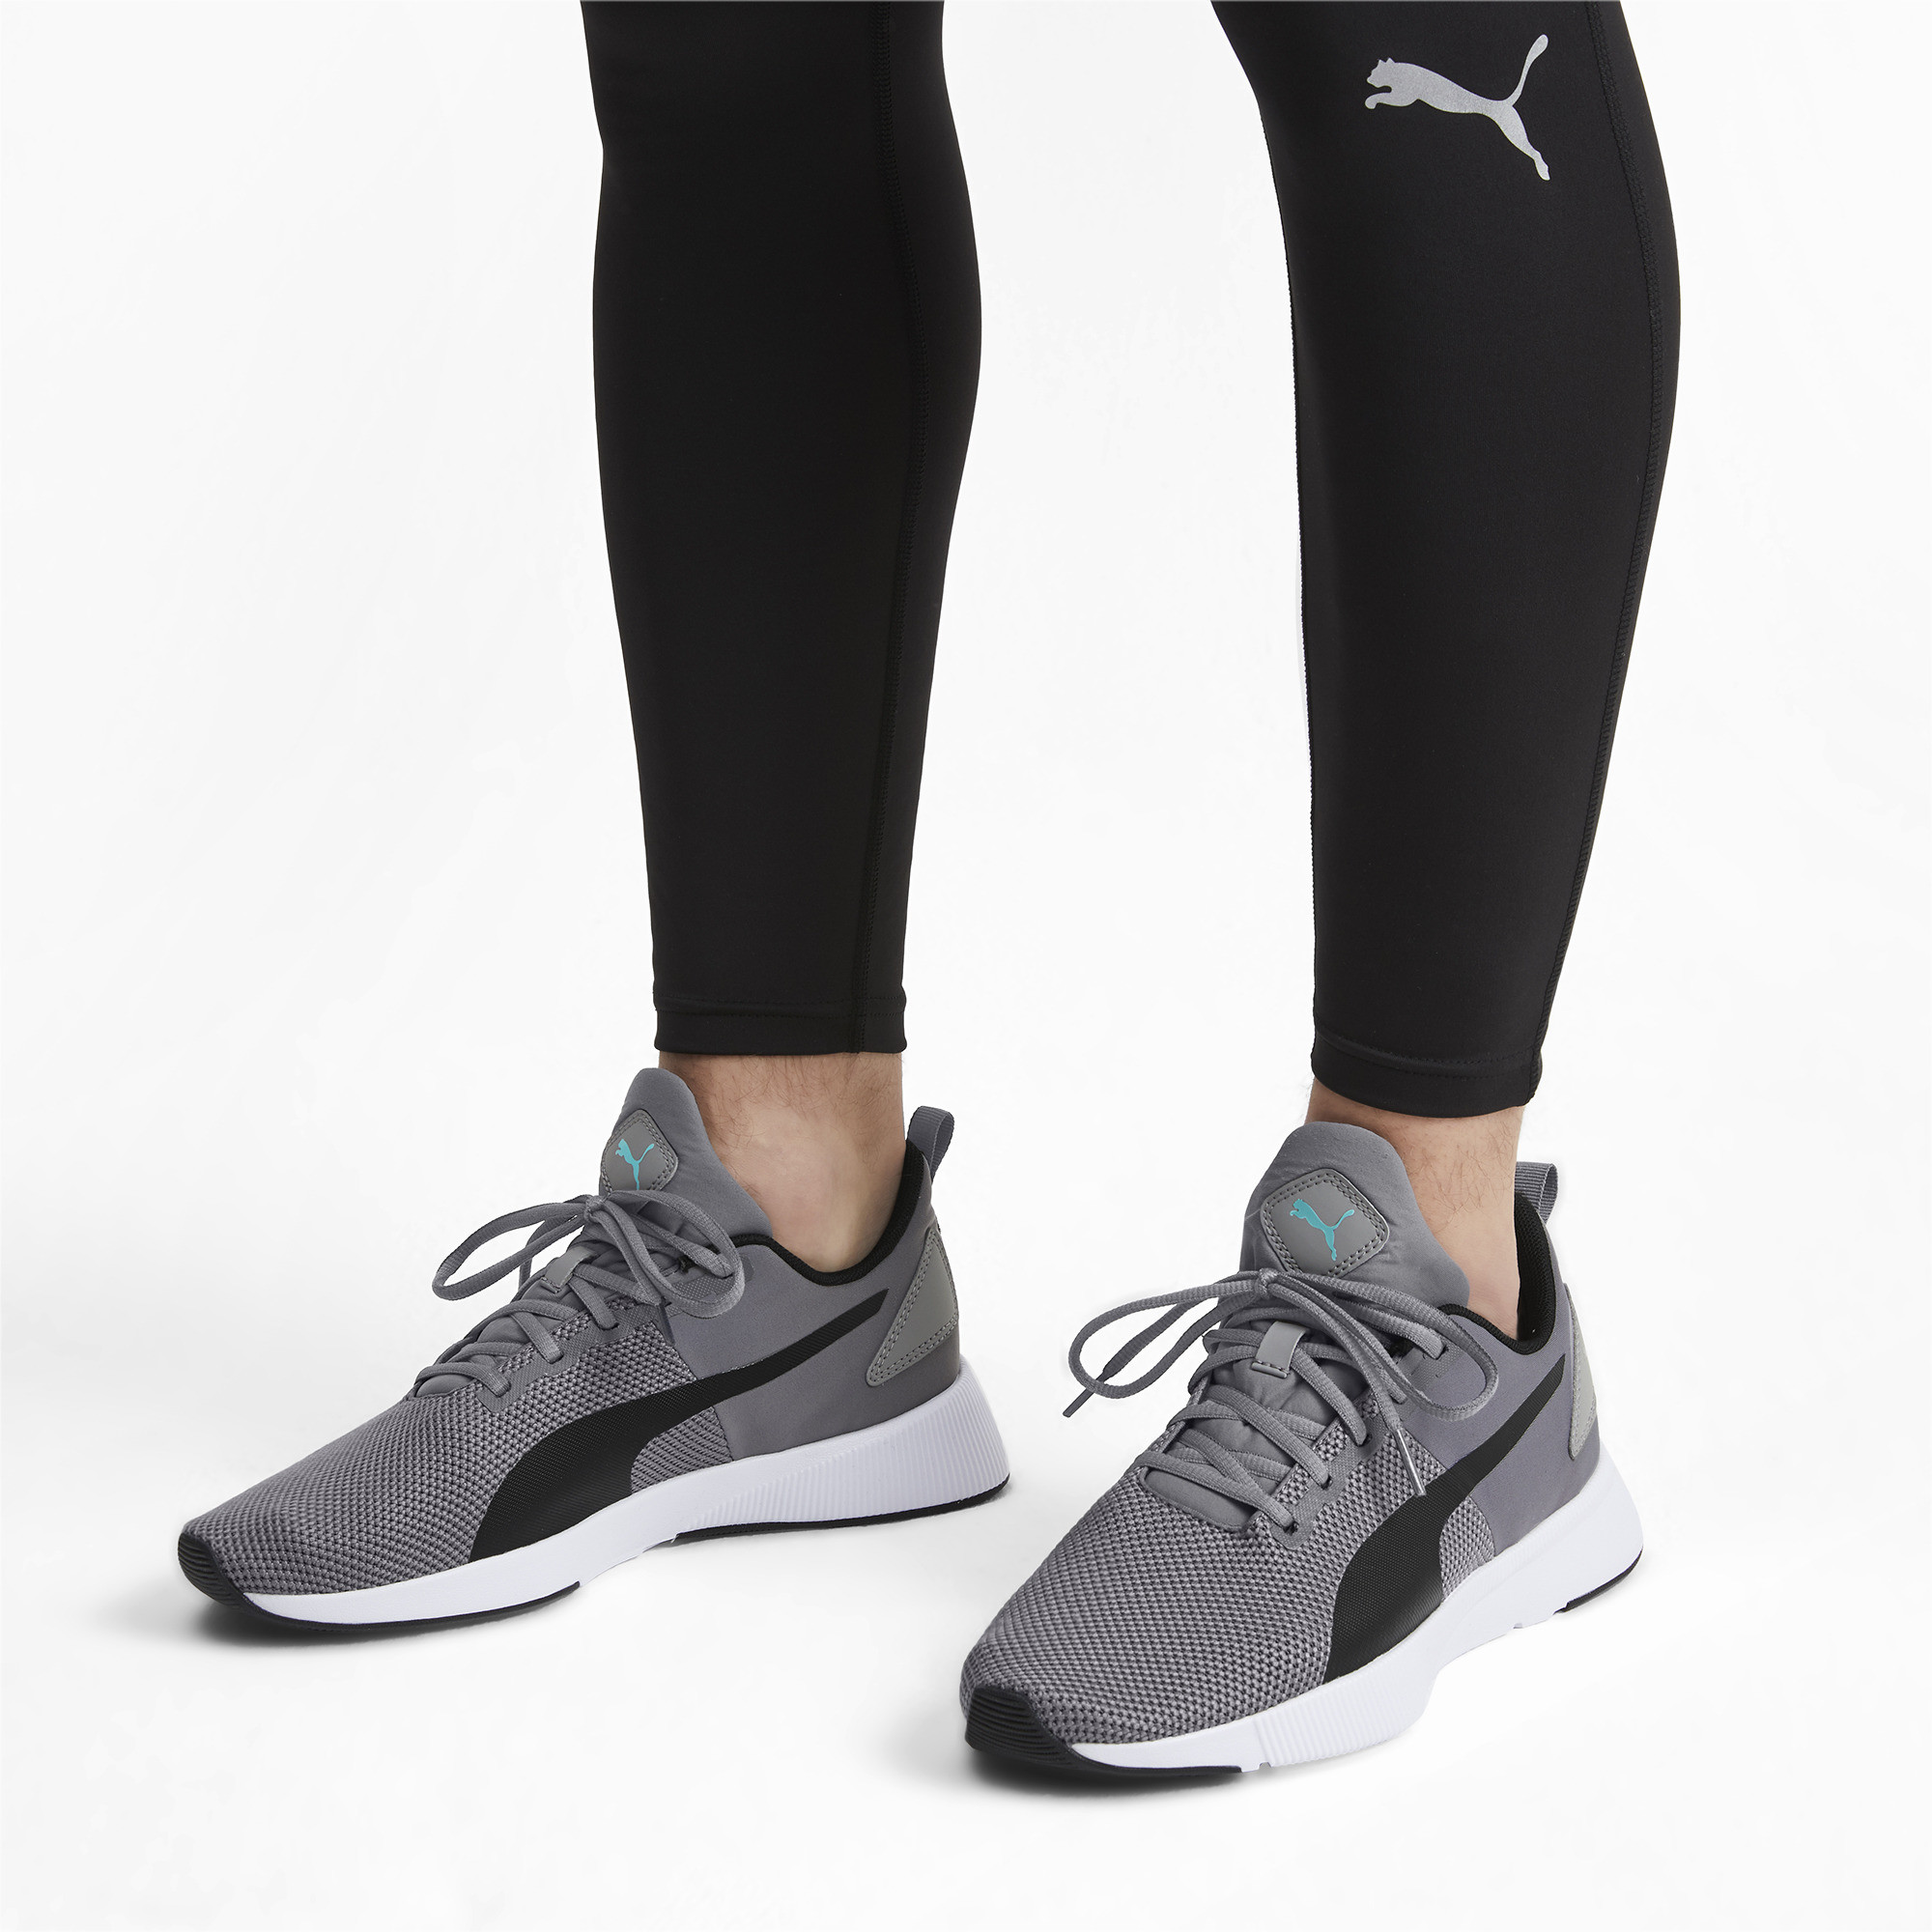 PUMA-Flyer-Runner-Running-Shoes-Mens-Shoe-Running thumbnail 17